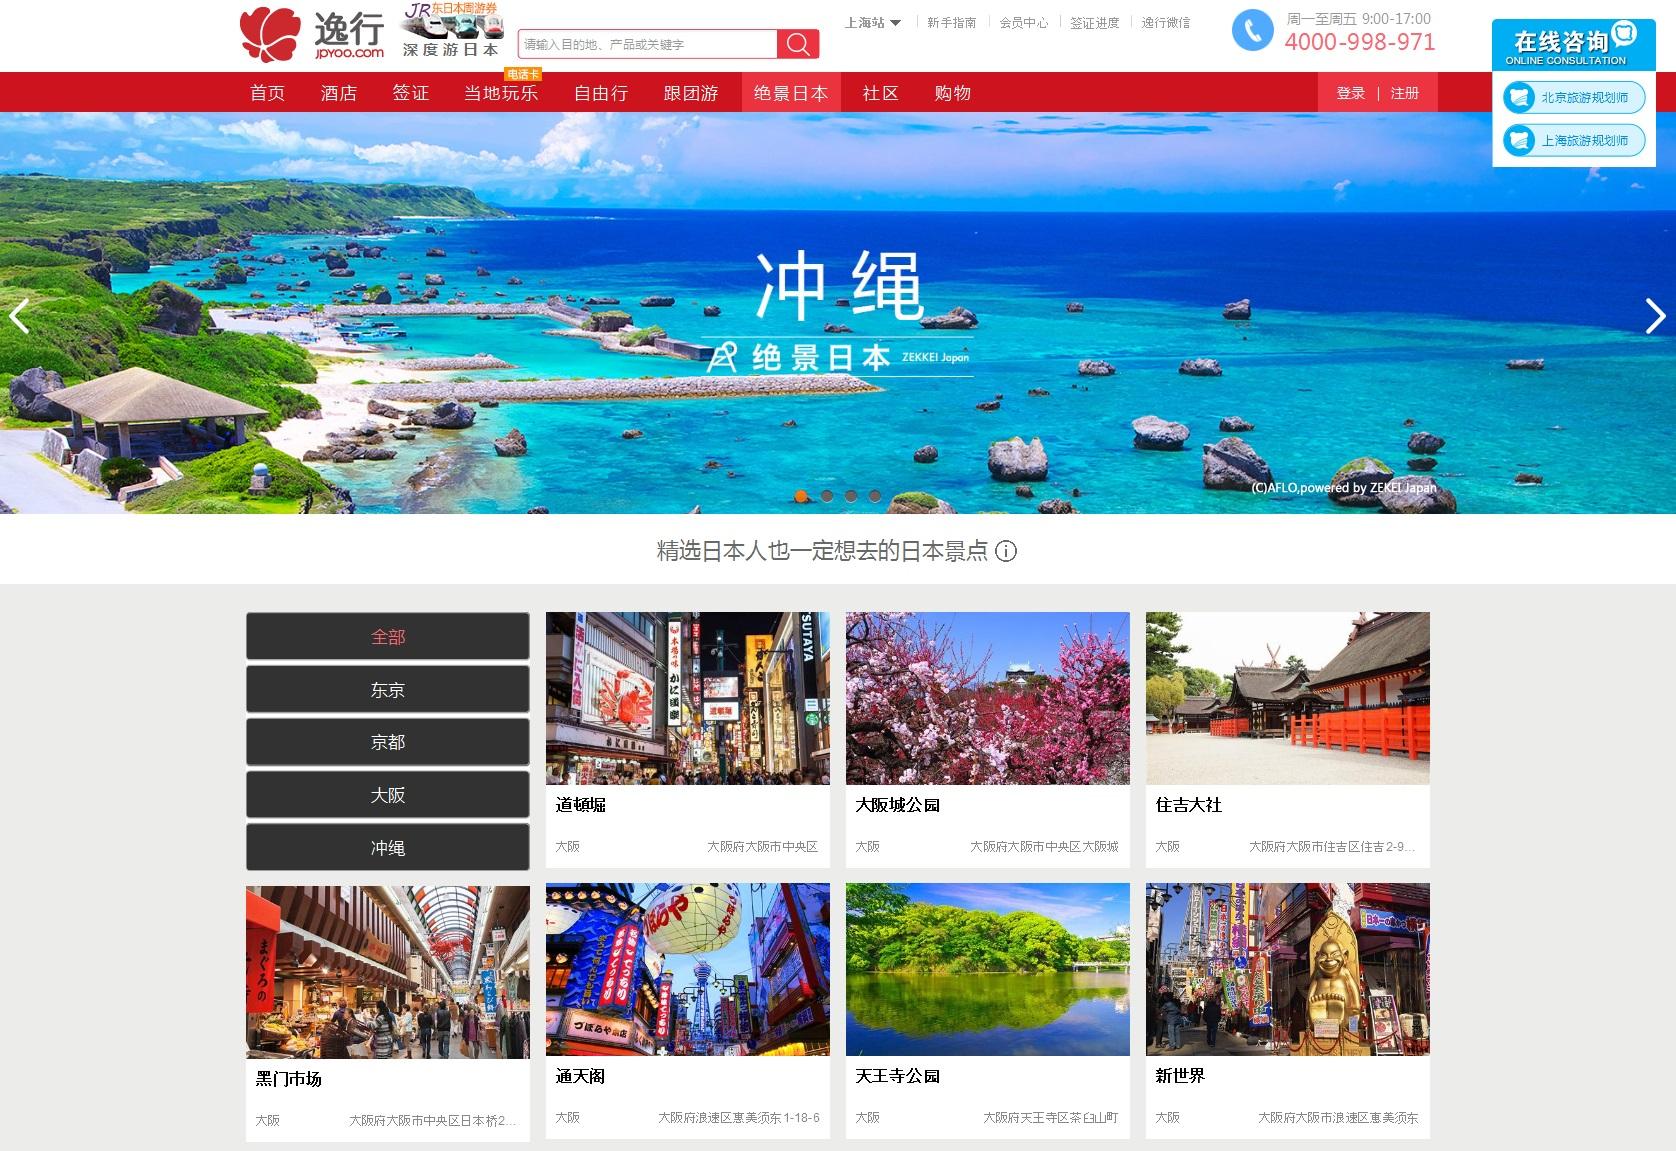 「ZEKKEI Japan」、中国の訪日個人旅行予約専門サイト「逸行」内に「絶景日本」を開設:共同通信より引用